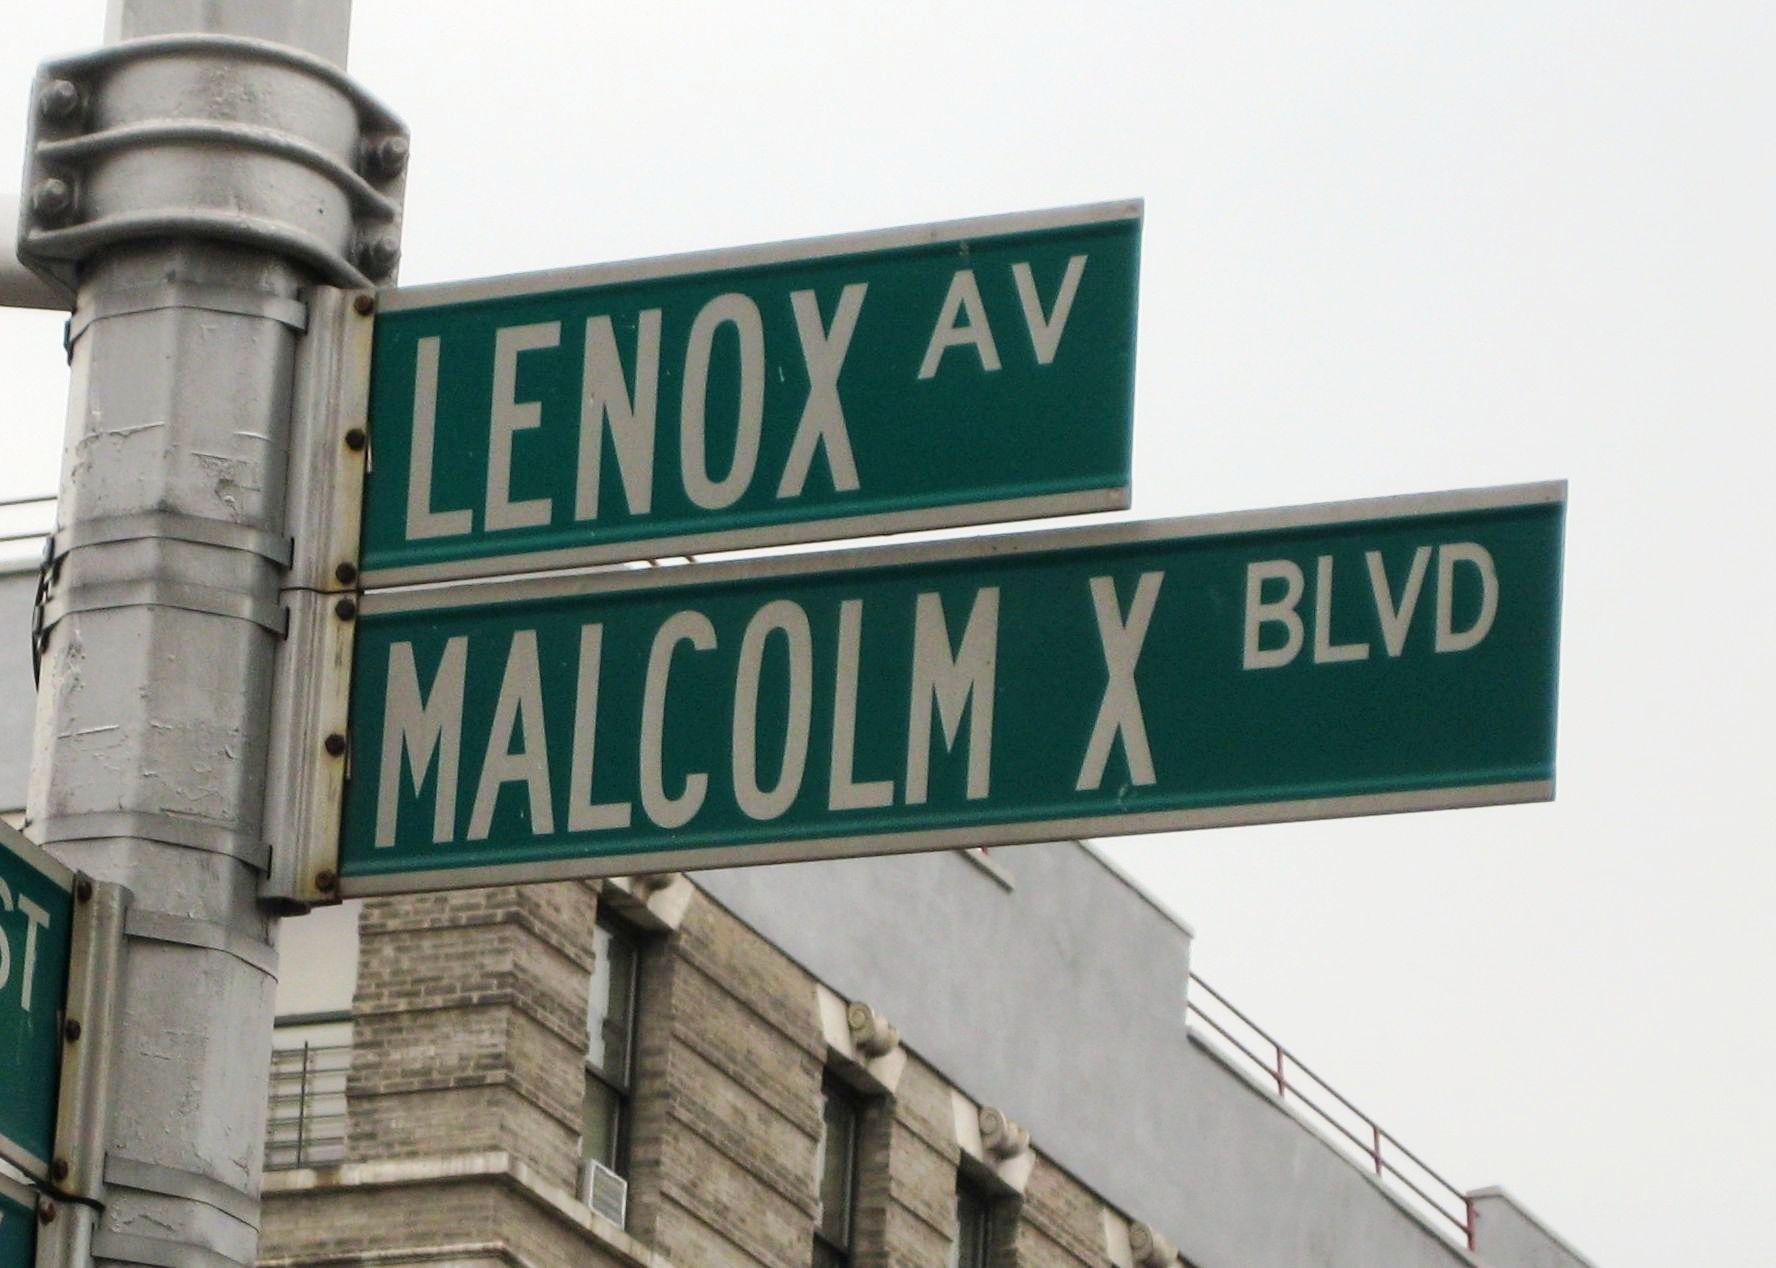 malcolm x blvd street sign.jpg